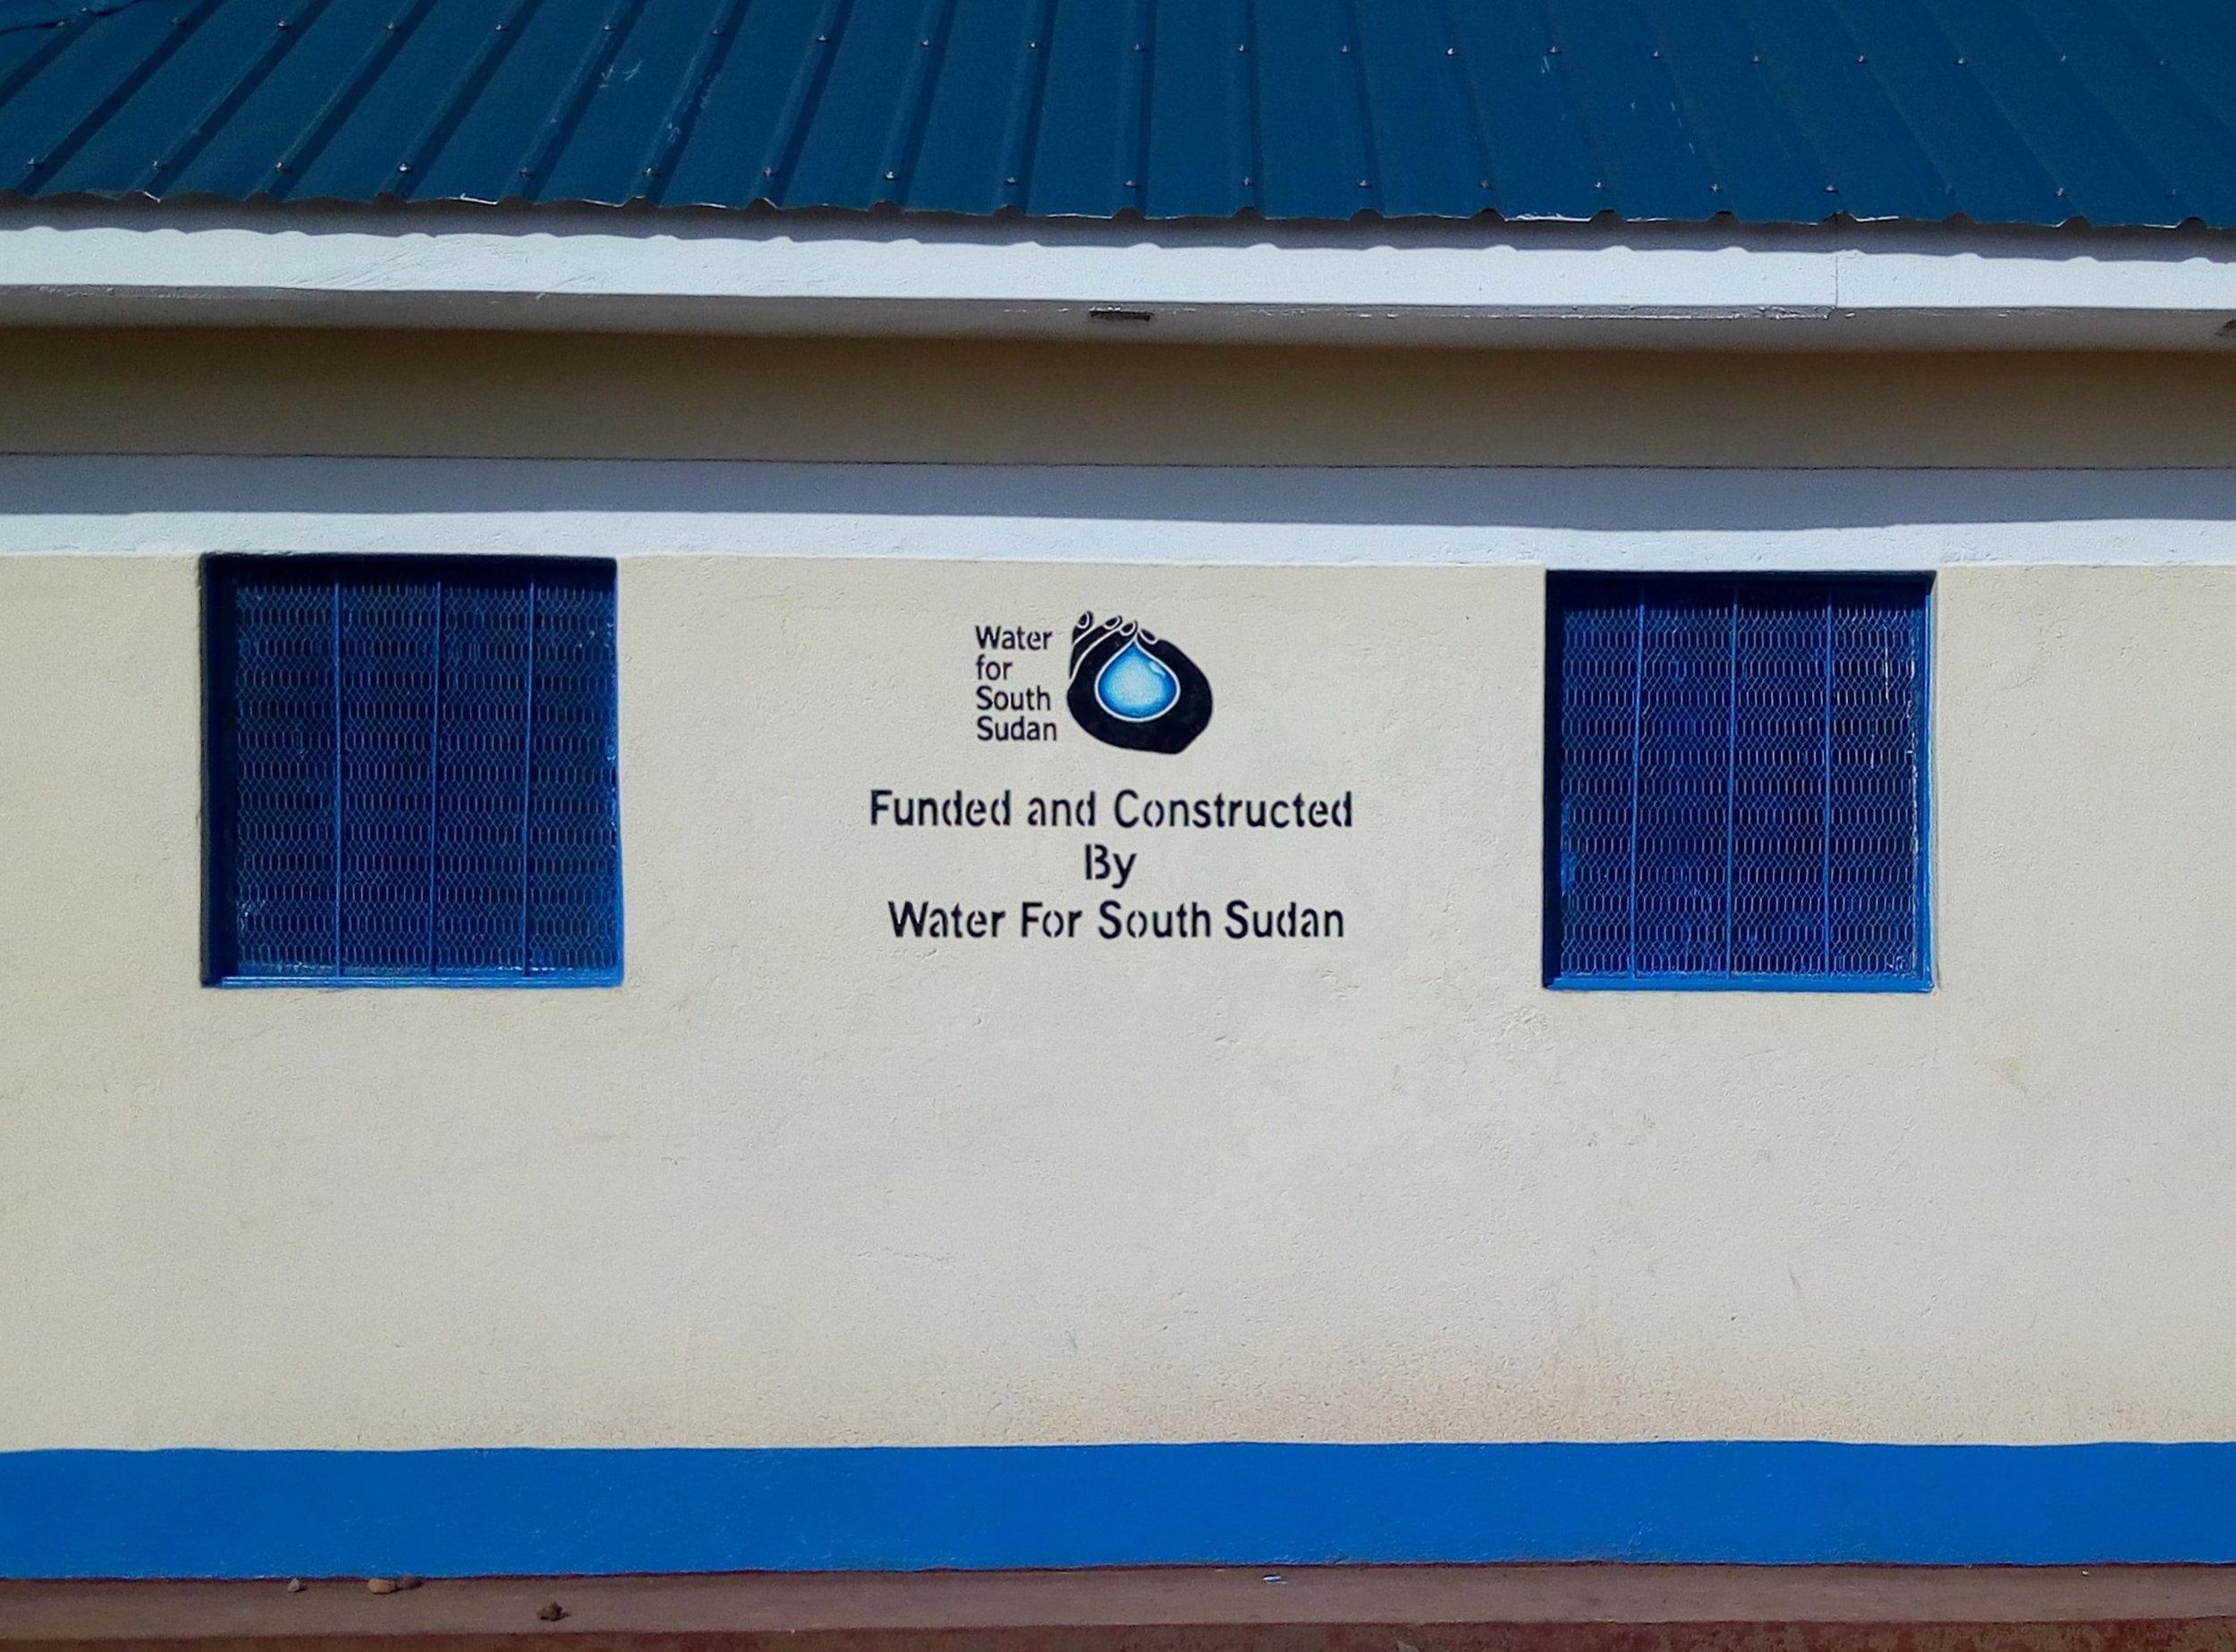 Finished latrine building at zogolona school in wau.